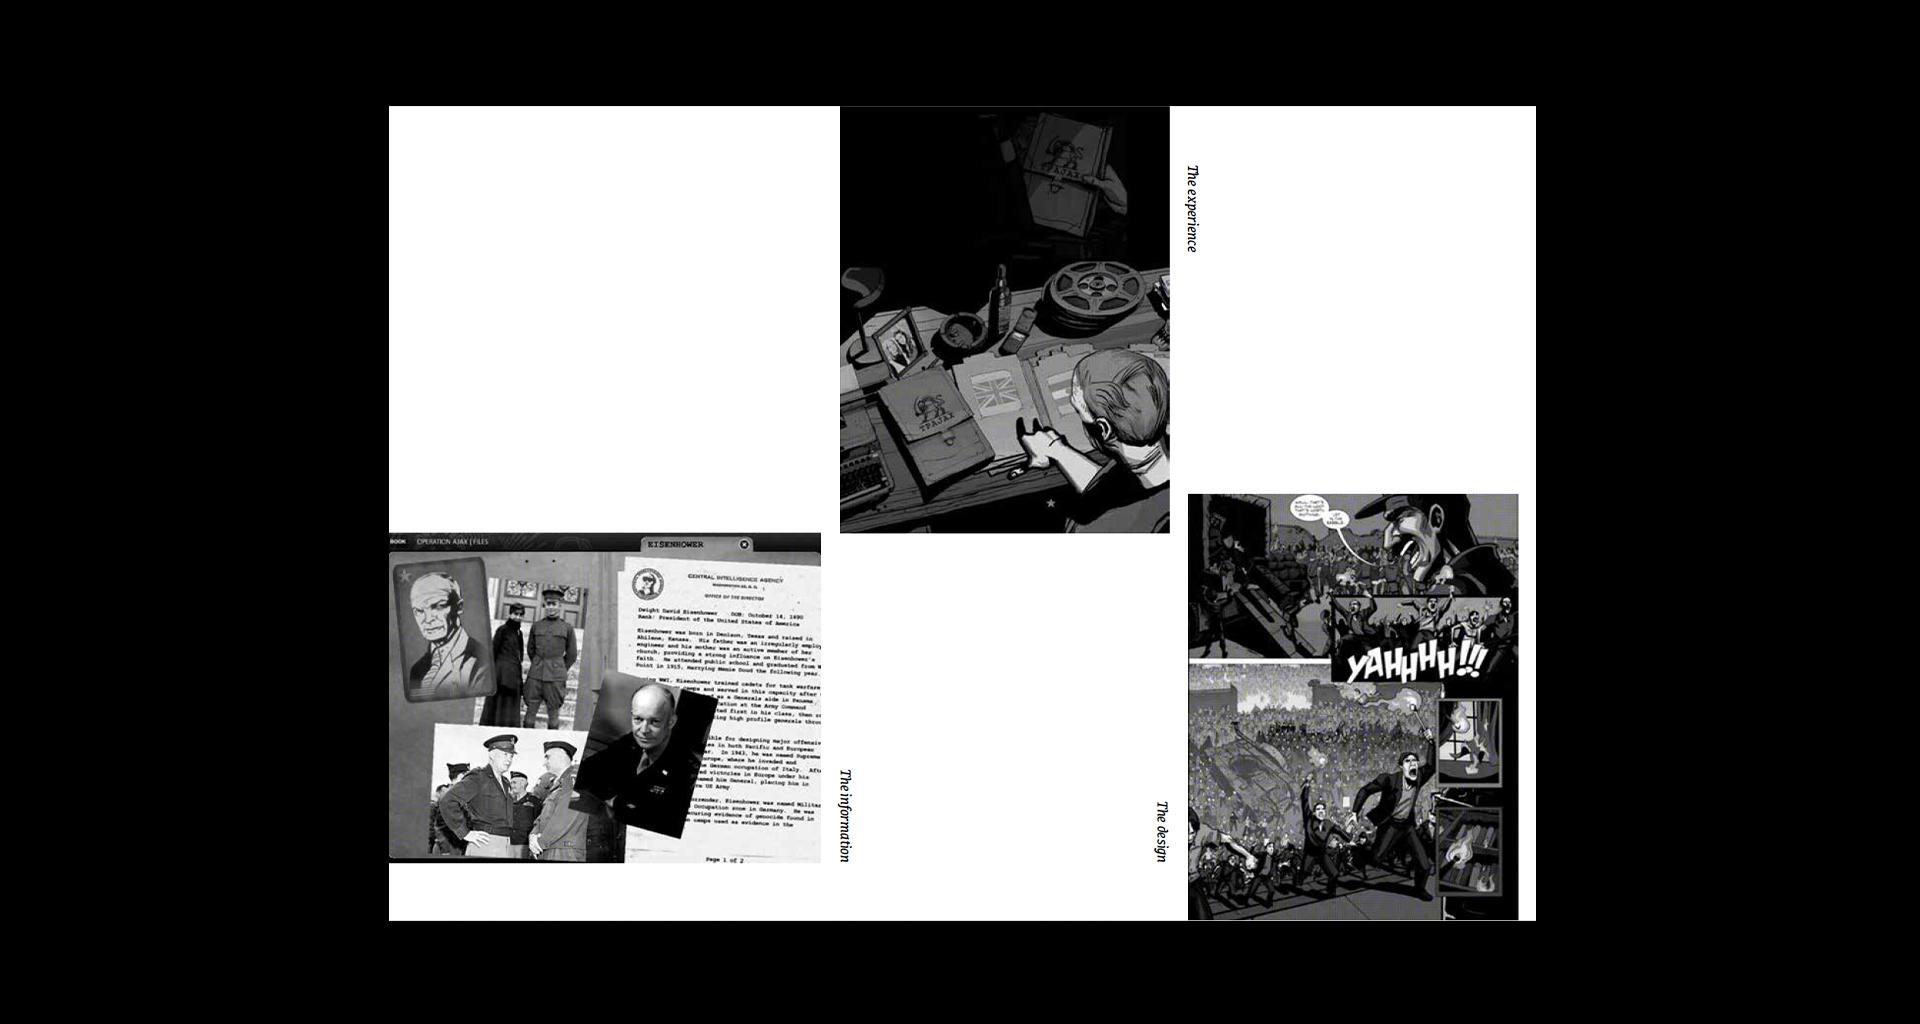 Dissertation_Photo_0005_Screenshot 2019-08-19 at 13.38.23.jpg